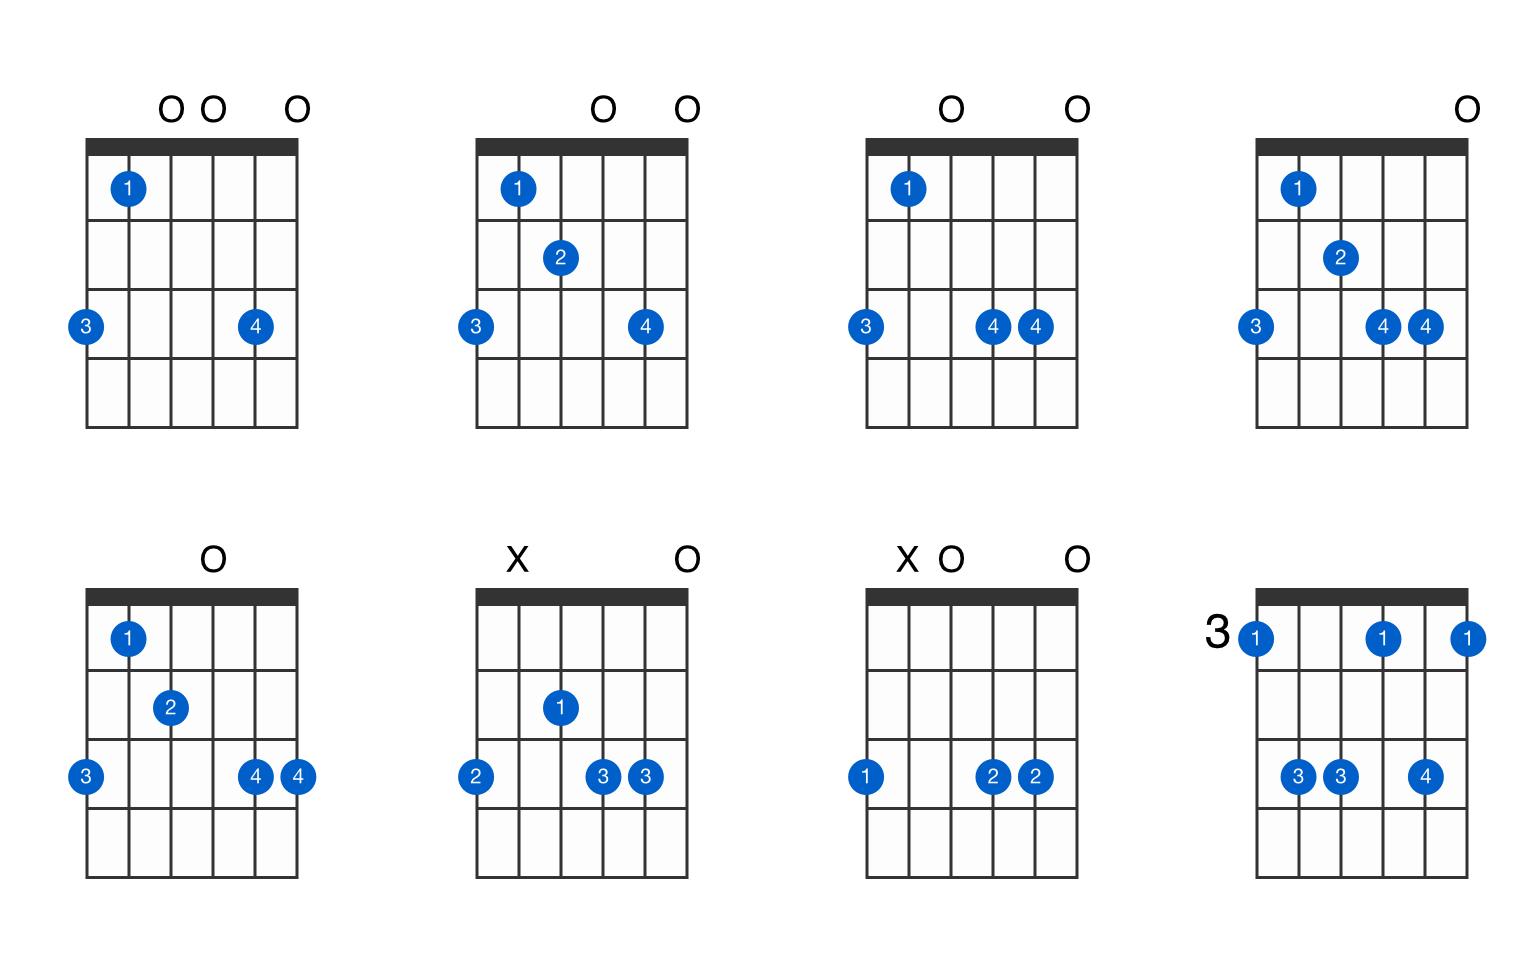 G minor major 15 guitar chord   GtrLib Chords